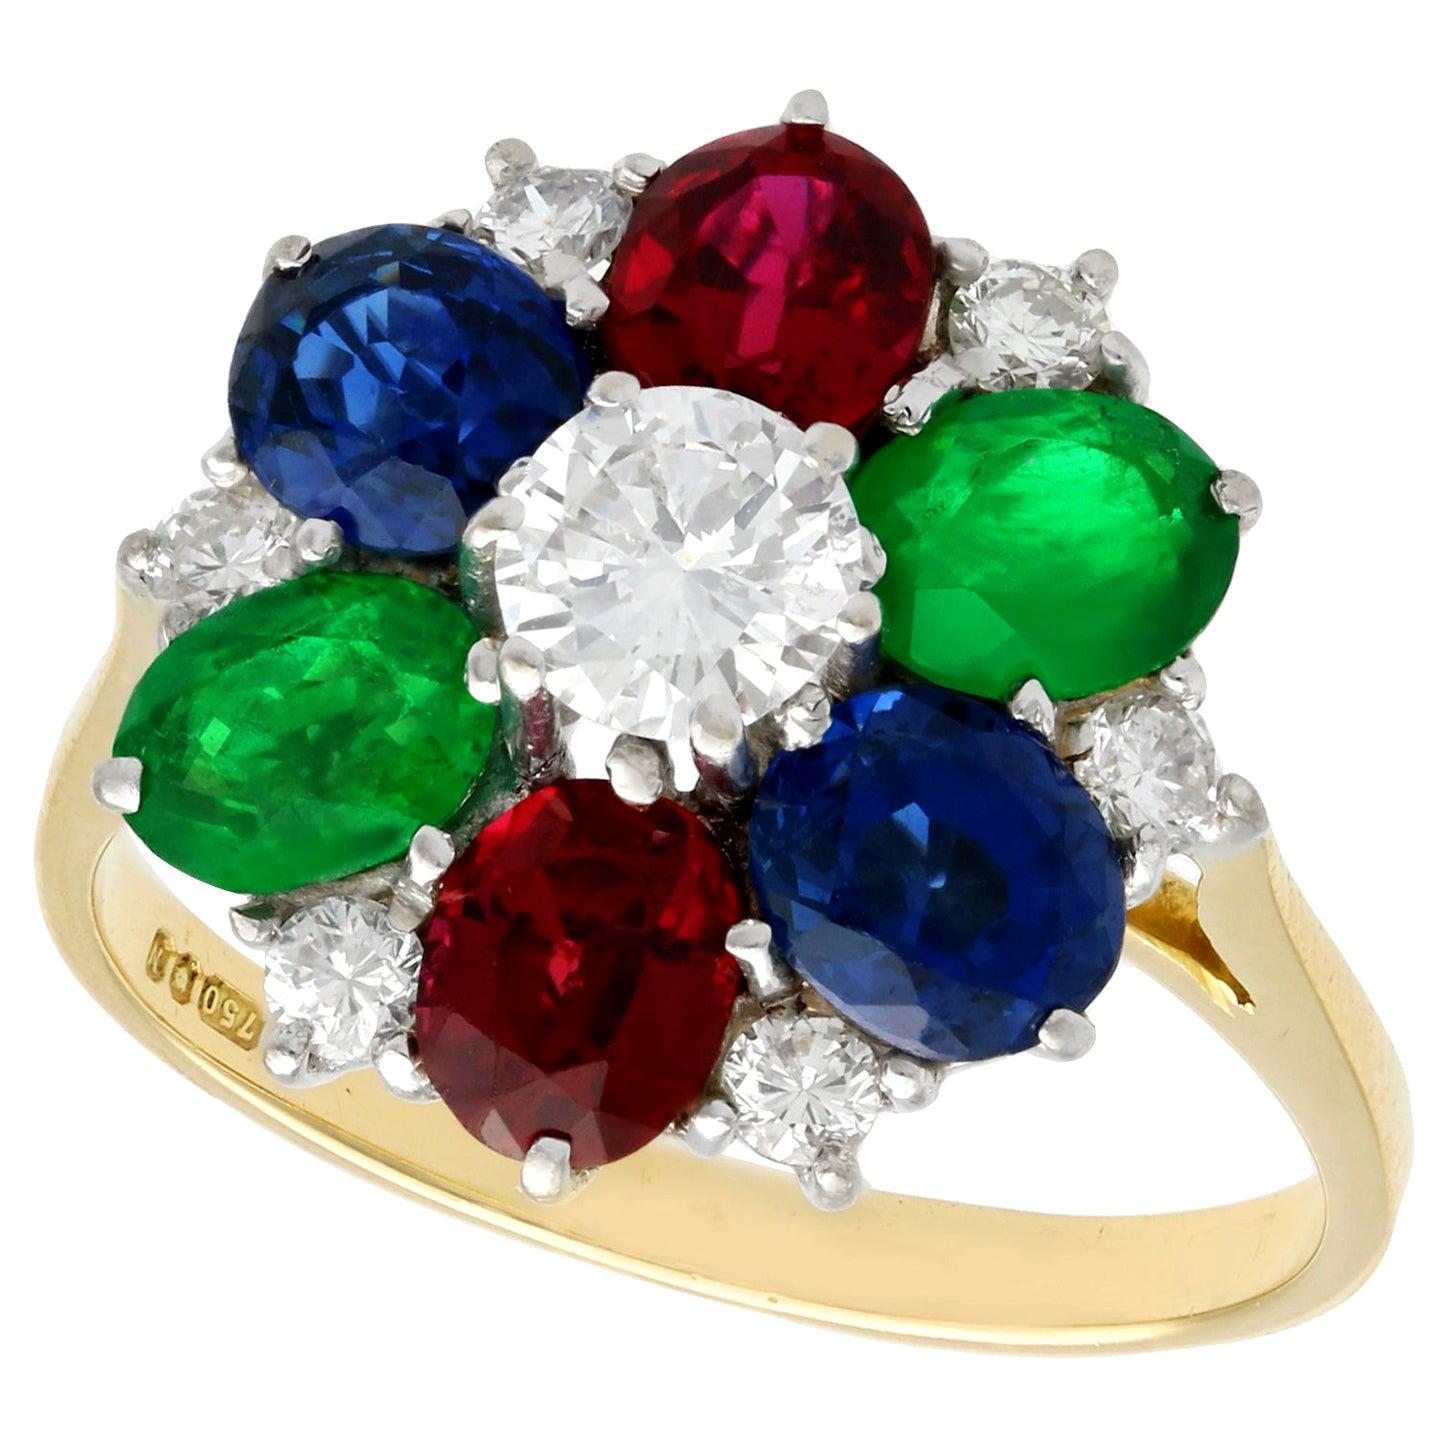 Garnet Sapphire Emerald and Diamond Cluster Ring